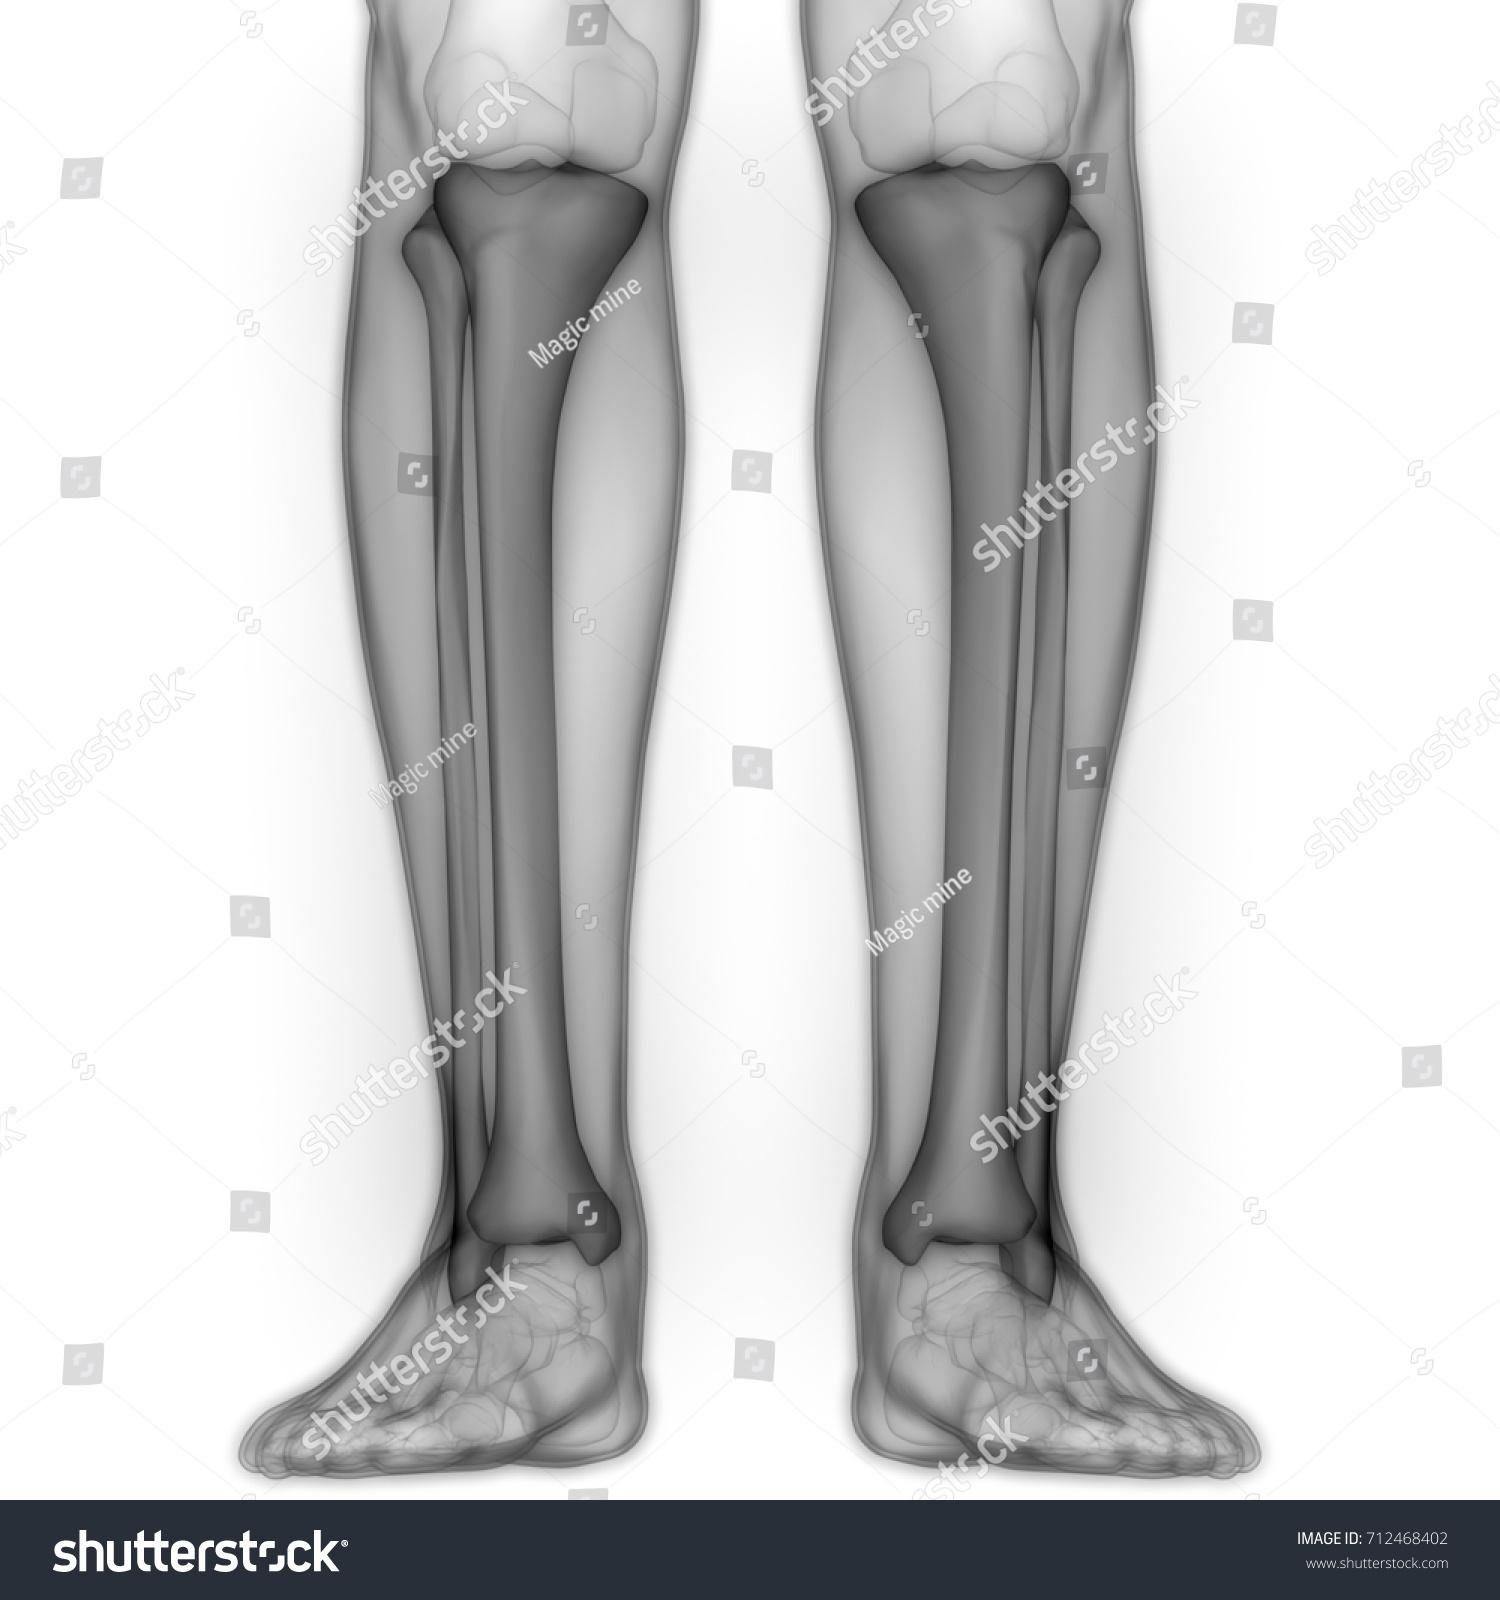 Human Body Bone Joint Pains Anatomy Stock Illustration 712468402 ...